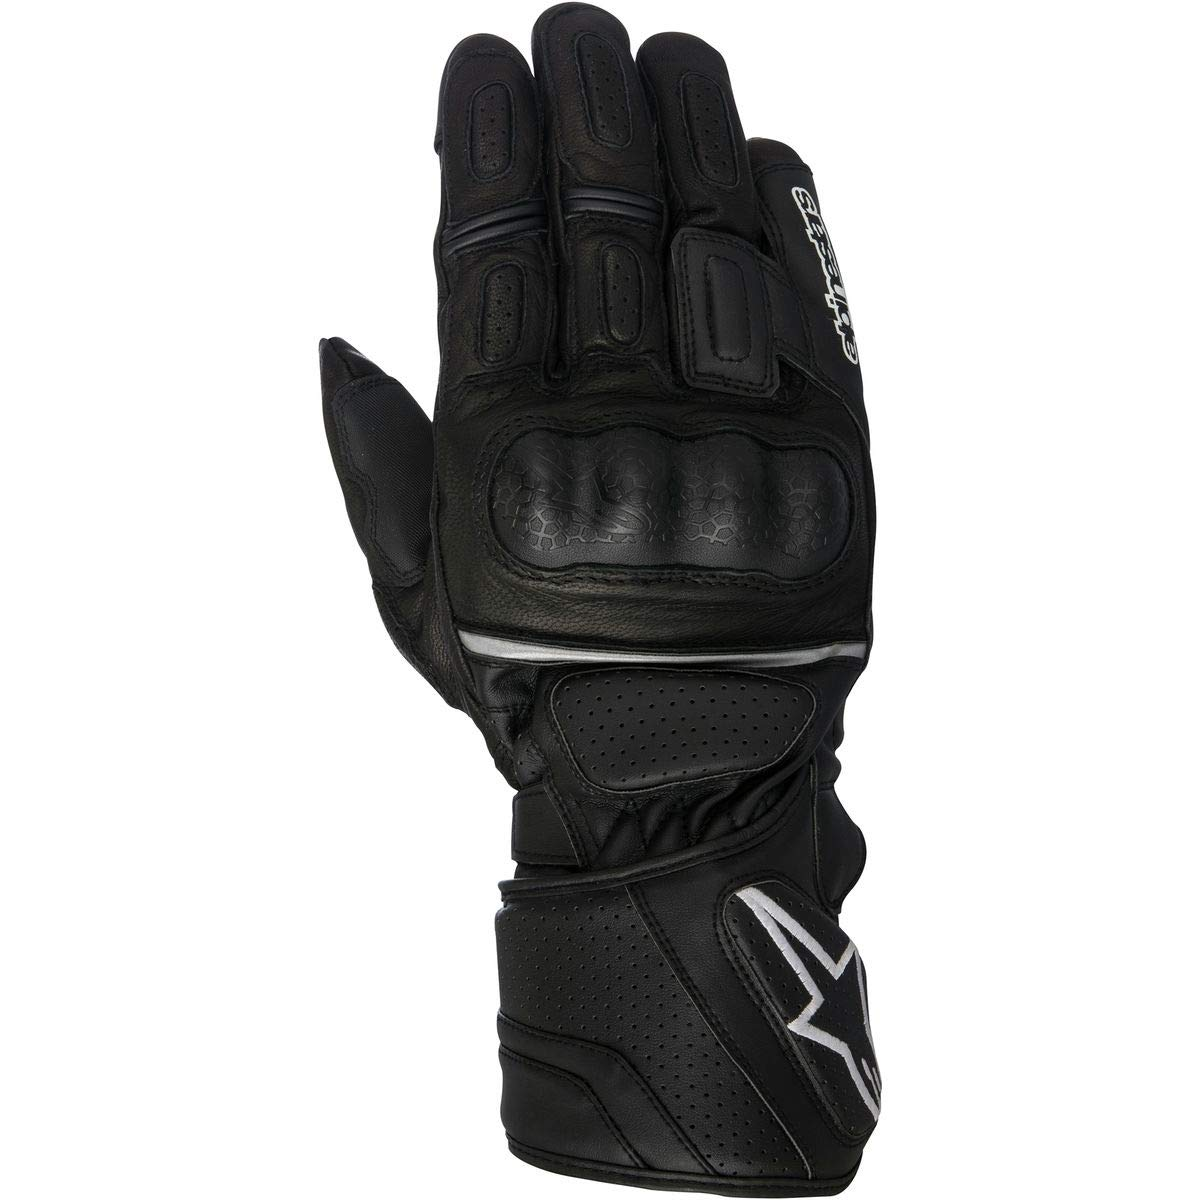 color negro Alpinestars sp-z Drystar impermeable guantes de moto de cuero